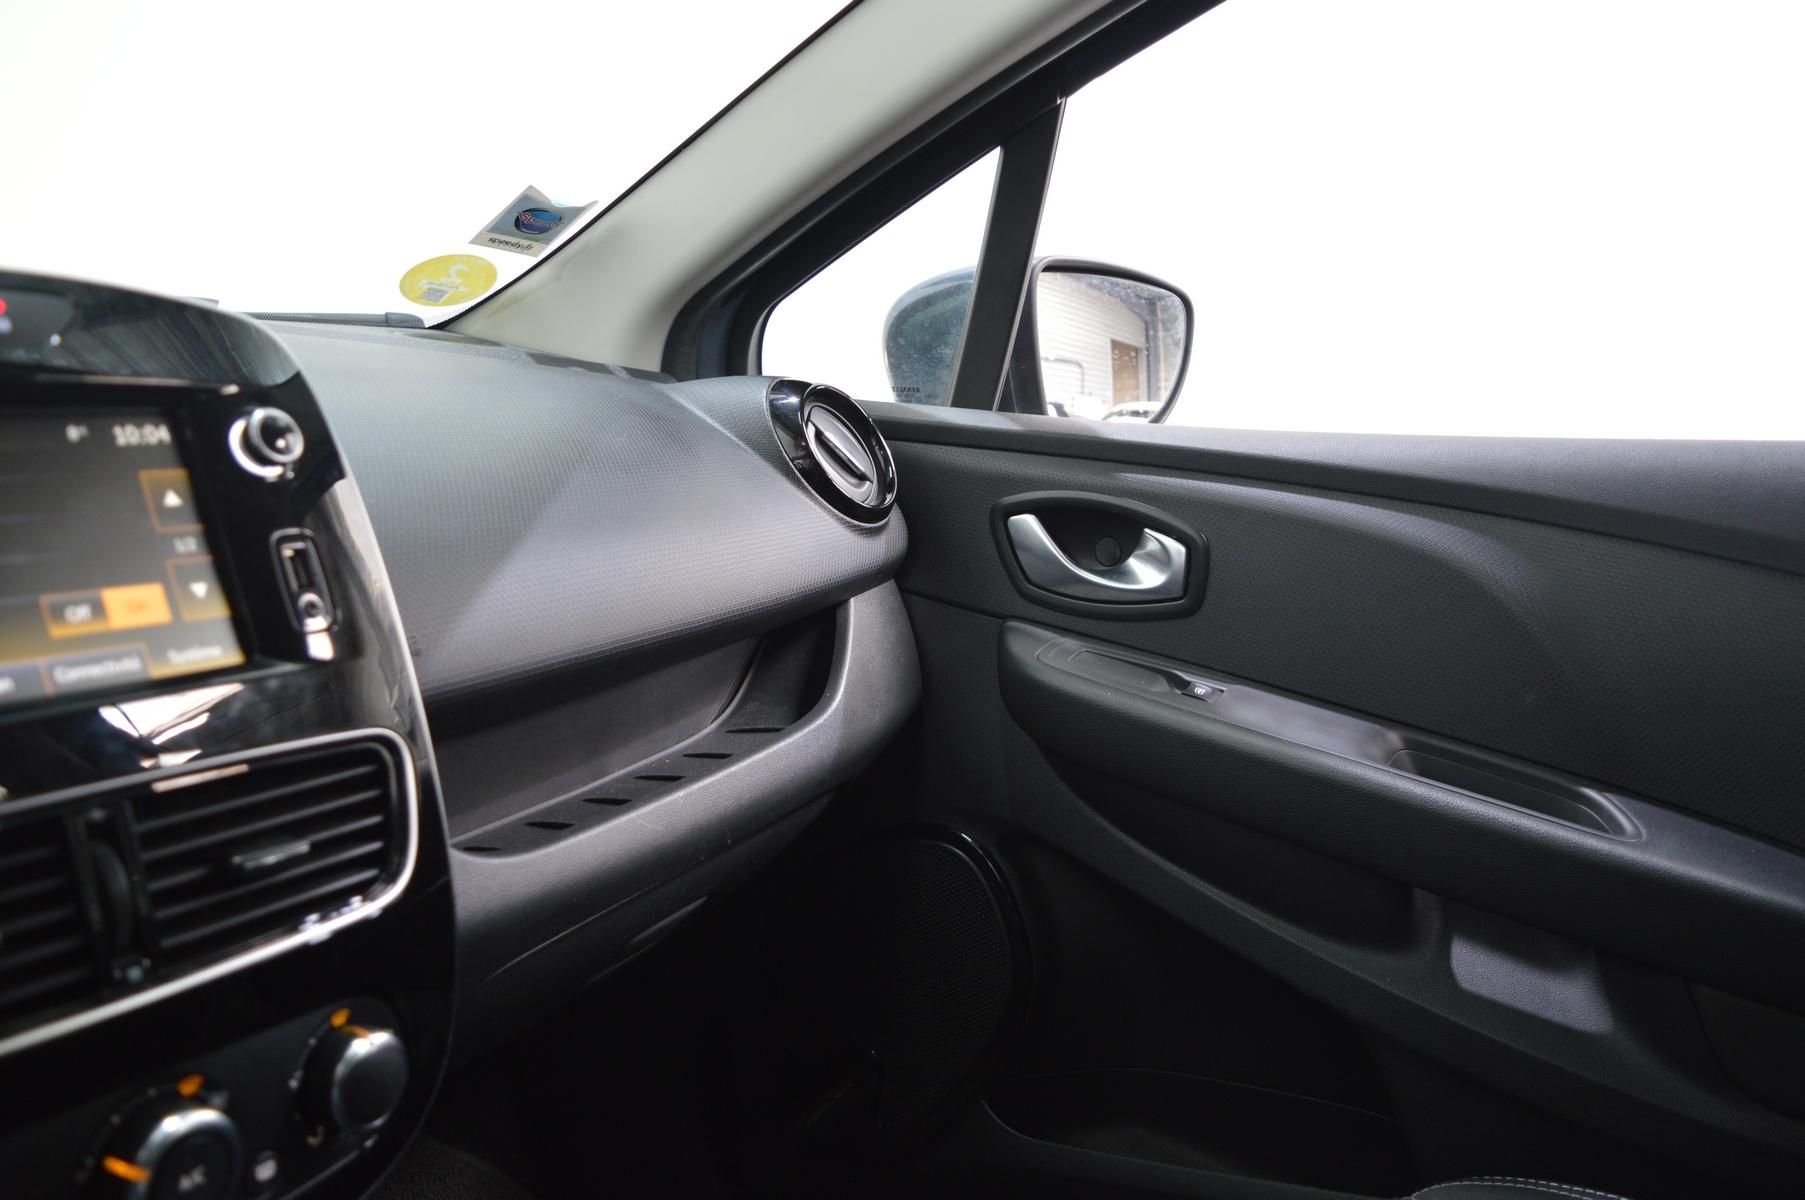 RENAULT CLIO IV ESTATE BUSINESS 2019 à 9800 € - Photo n°31